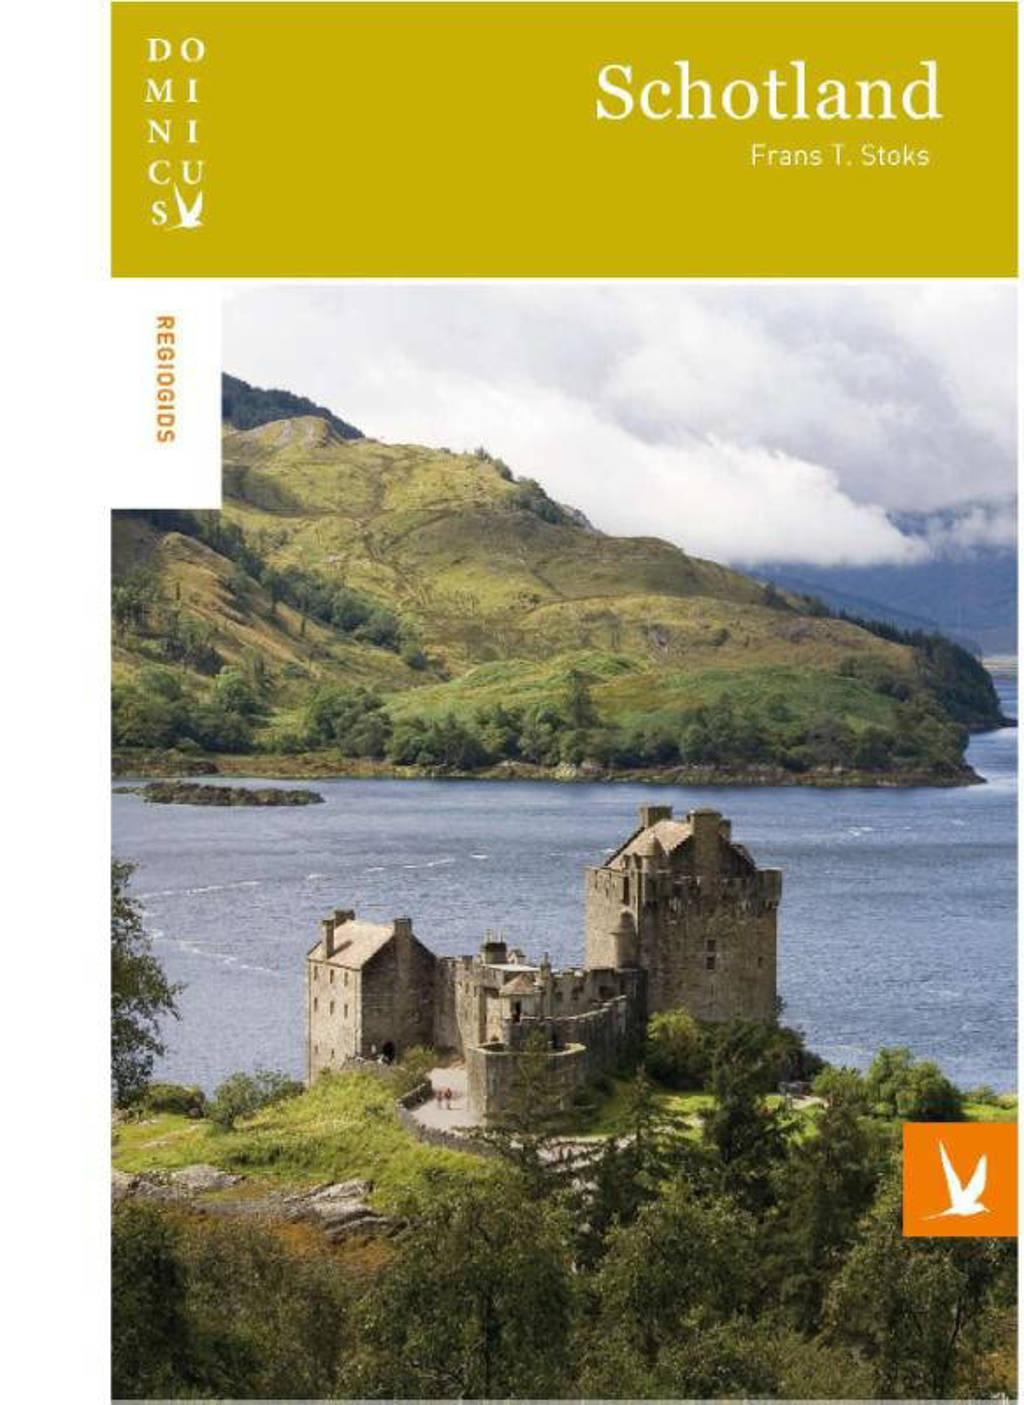 Dominicus Regiogids: Schotland - Frans T. Stoks